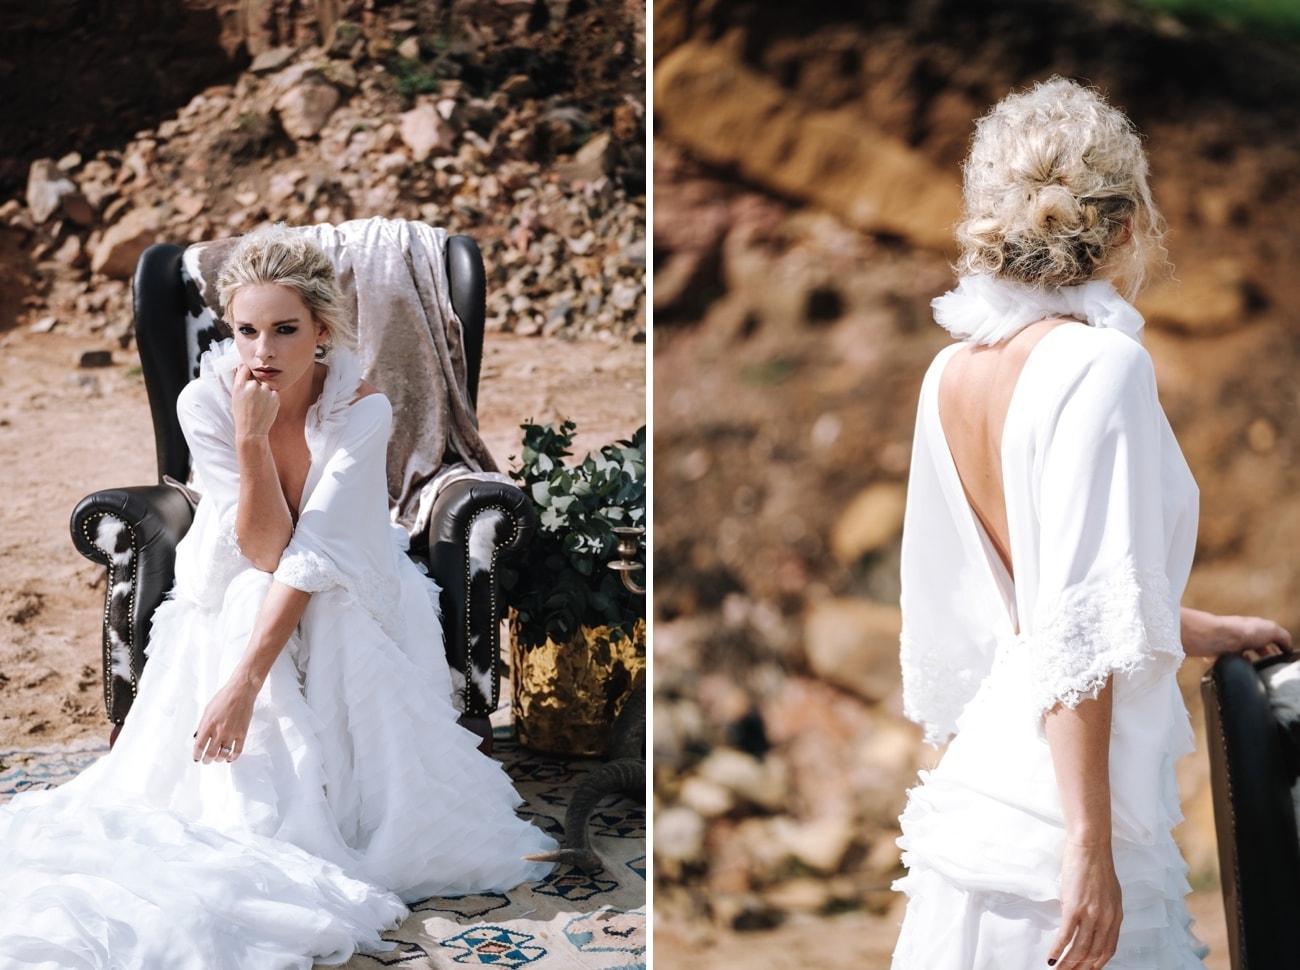 Atmospheric Wedding Inspiration | Credit: The Shank Tank